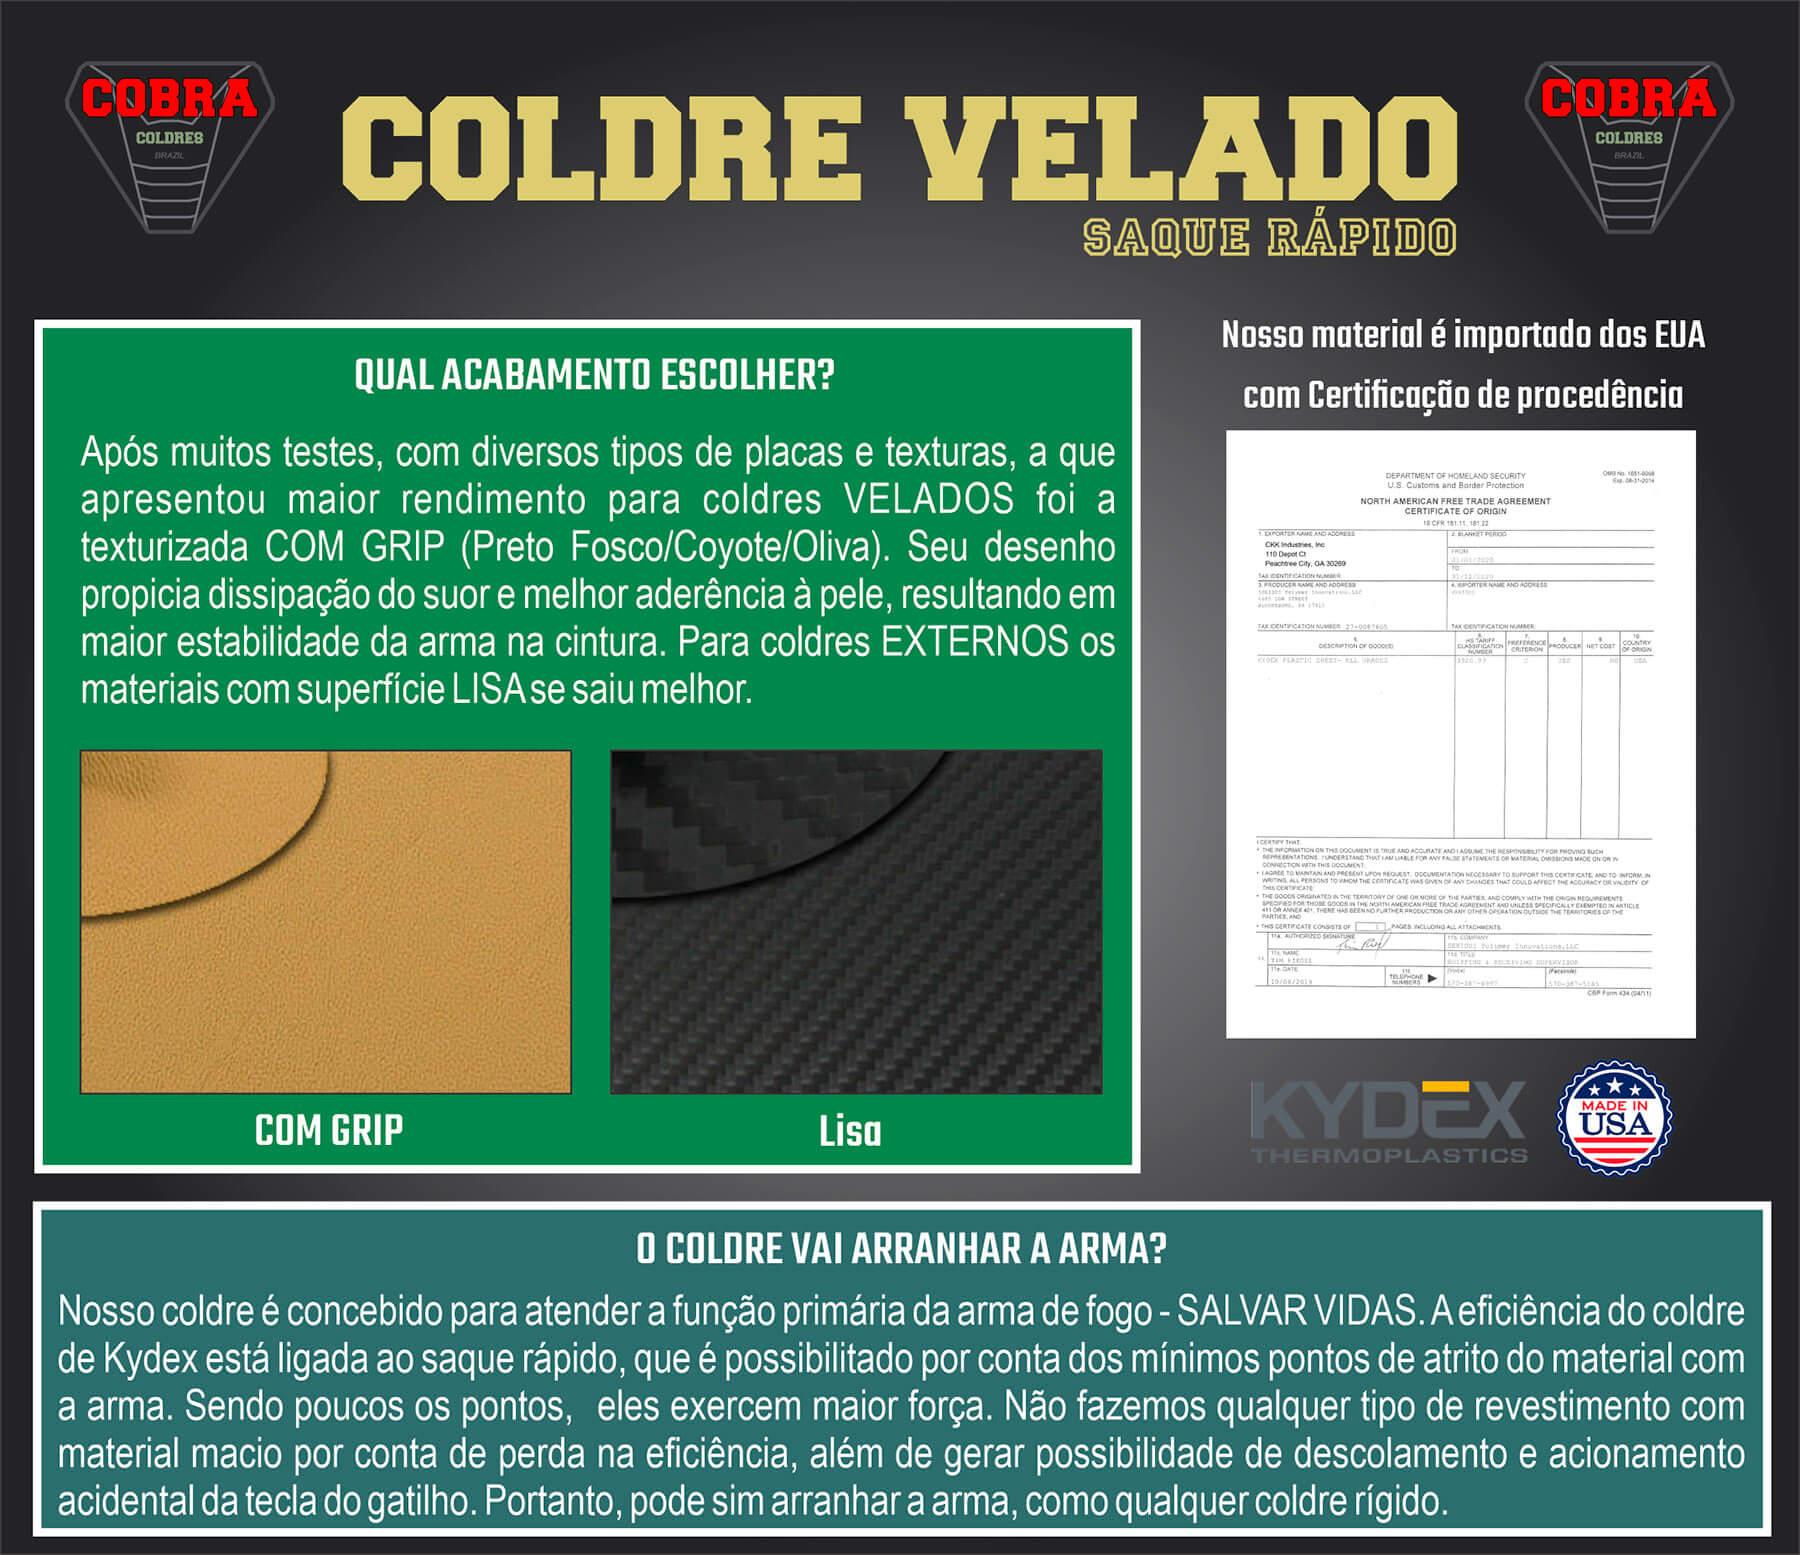 Coldre Slim [TH9] [TH40] [TH380] [PT840] [PT838] [PT809] [840] [TH] Taurus Saque Rápido Velado Kydex® 080 - Carbono